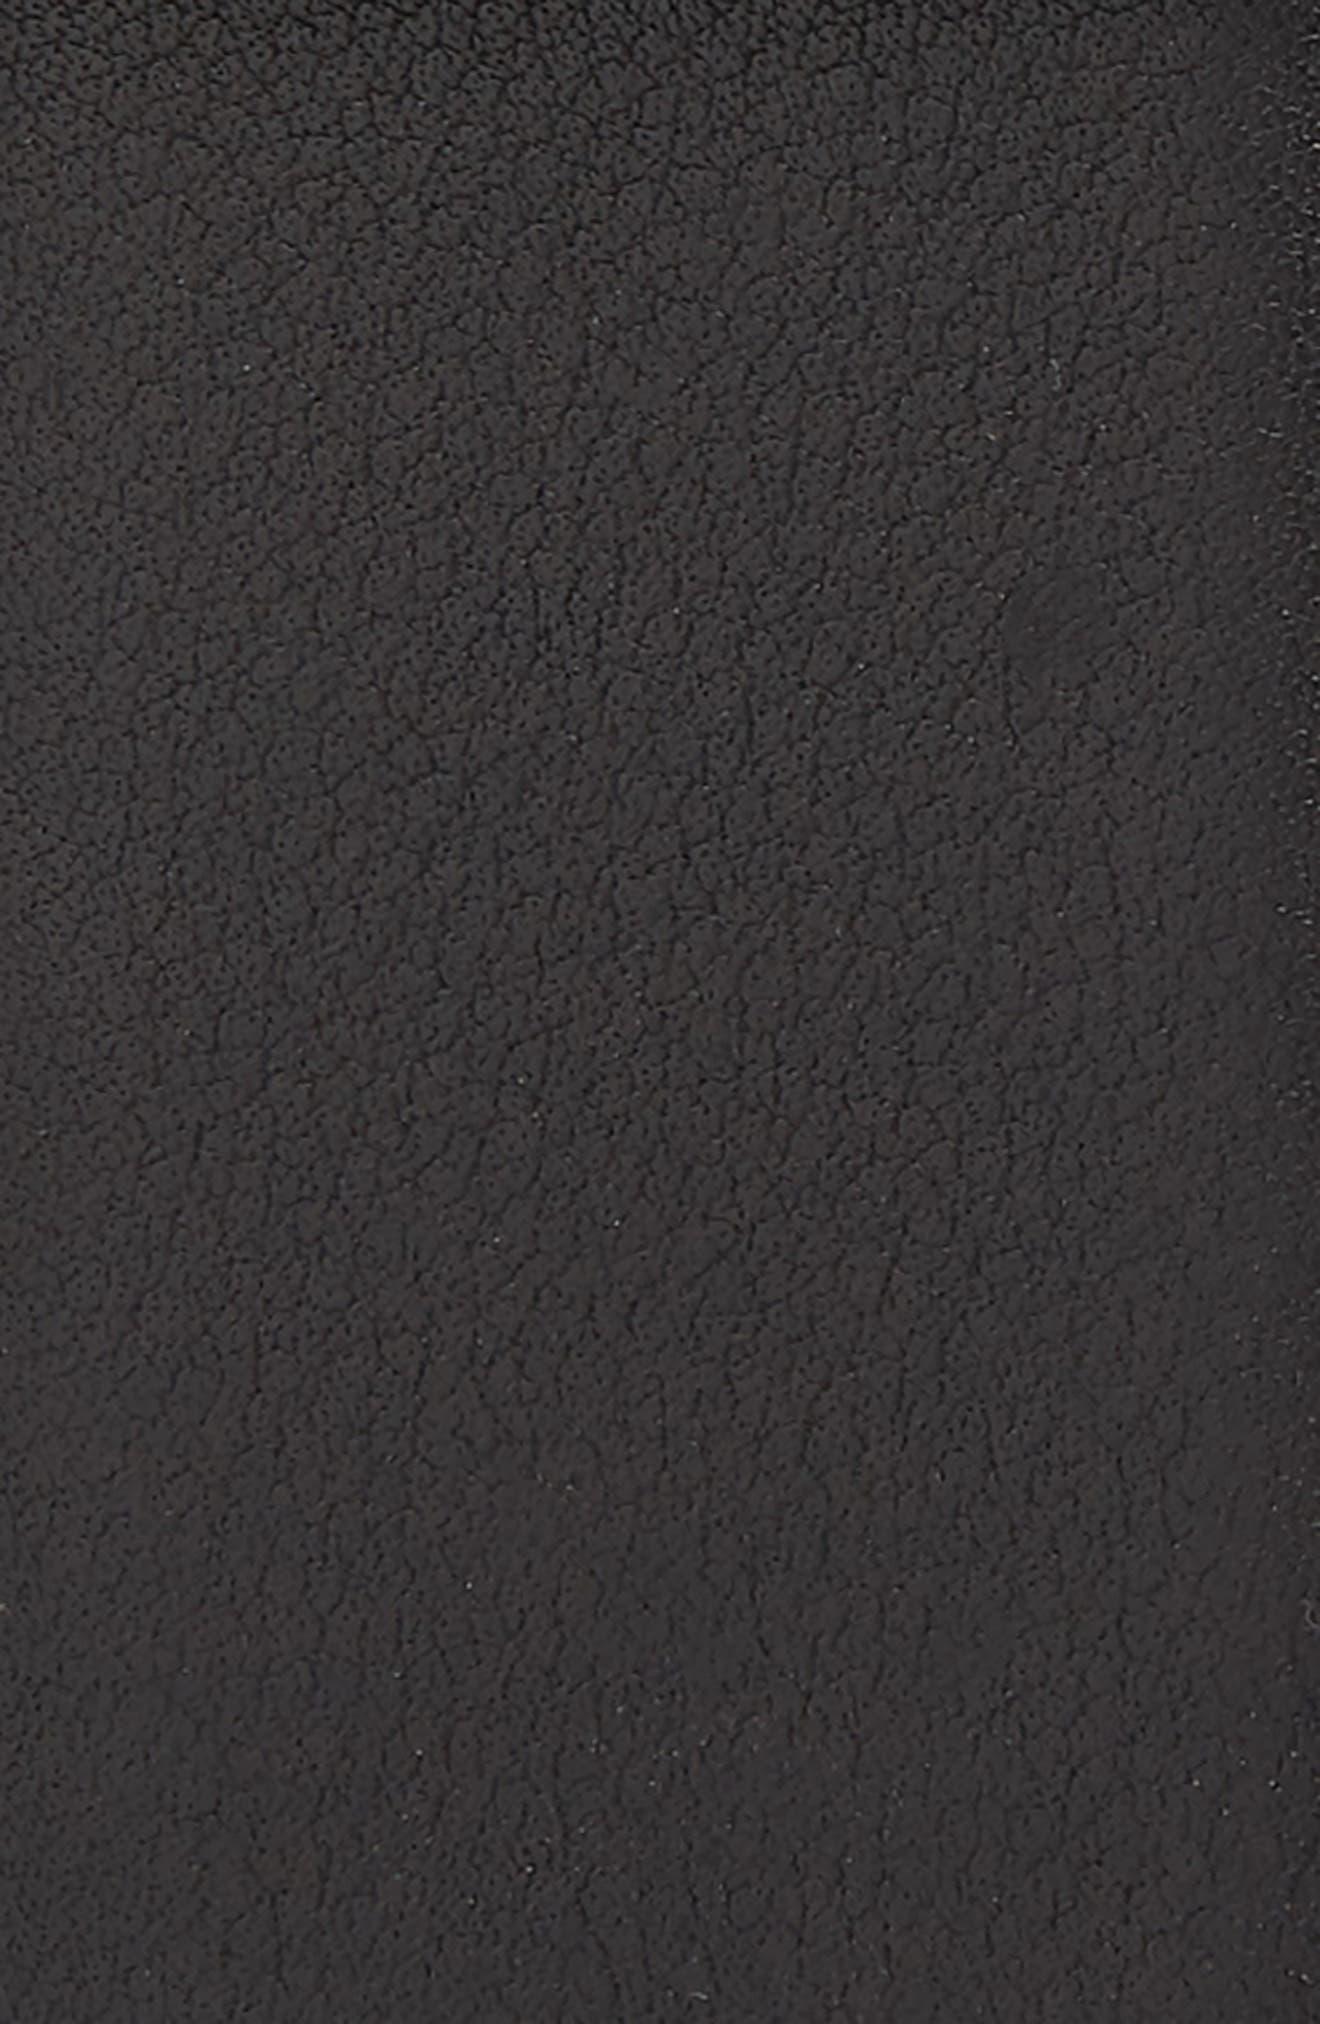 Gancio Leaf Buckle Leather Belt,                             Alternate thumbnail 2, color,                             001